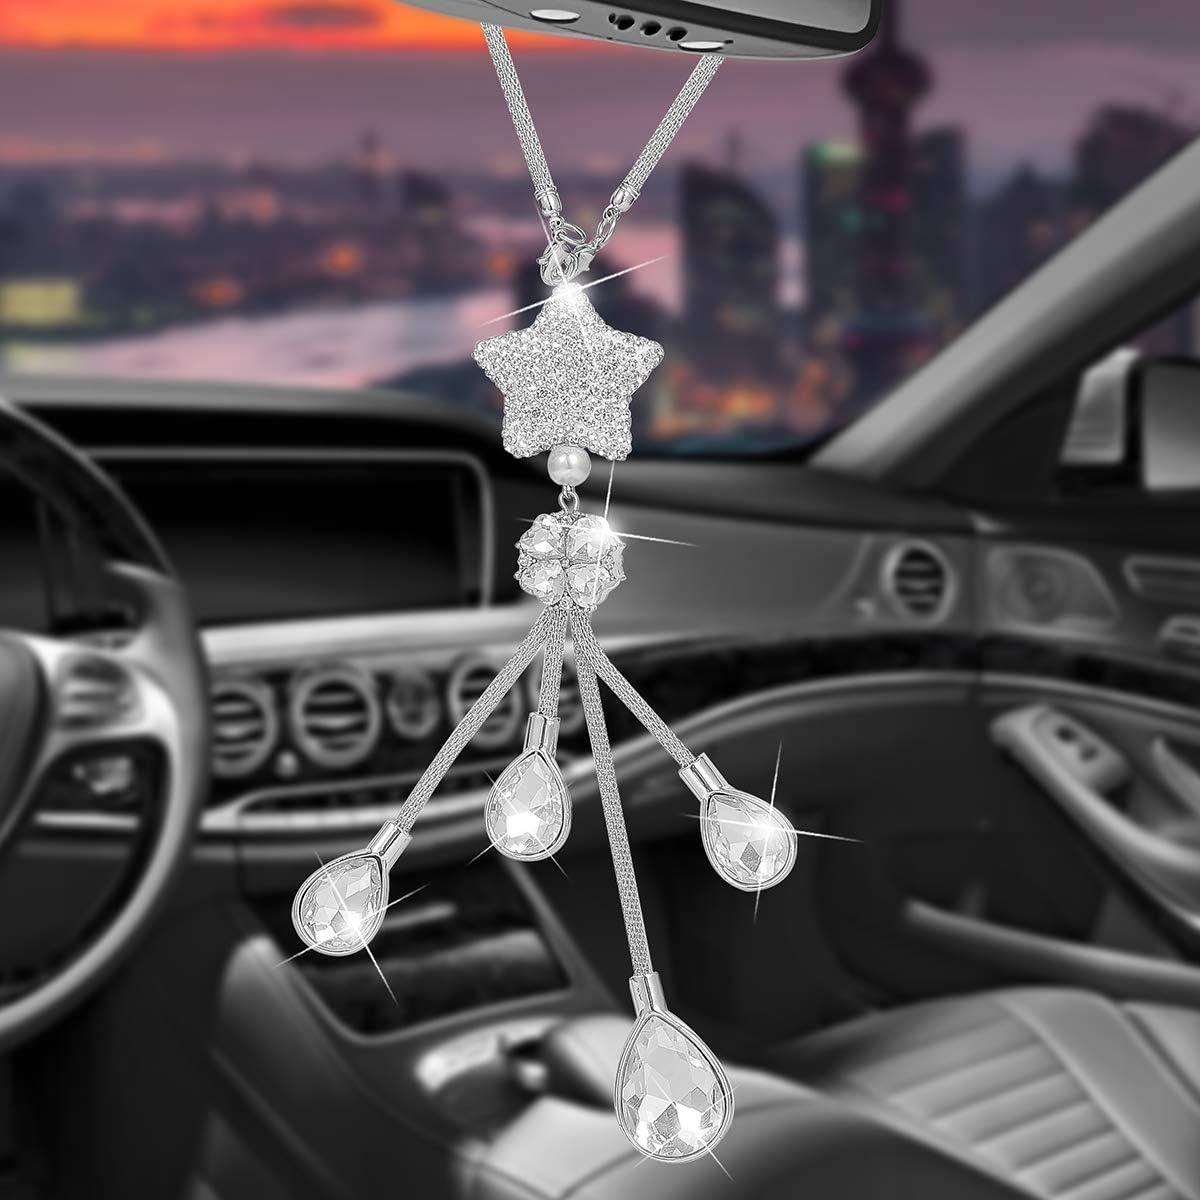 YCHZ White Bling Car Accessories for Women and Men Pretty White Lucky Star Car Decoration Crystal Star Rear View Mirror Charm Rhinestone Diamond Sun Catcher Ornament Pendant (White Star Pendant)